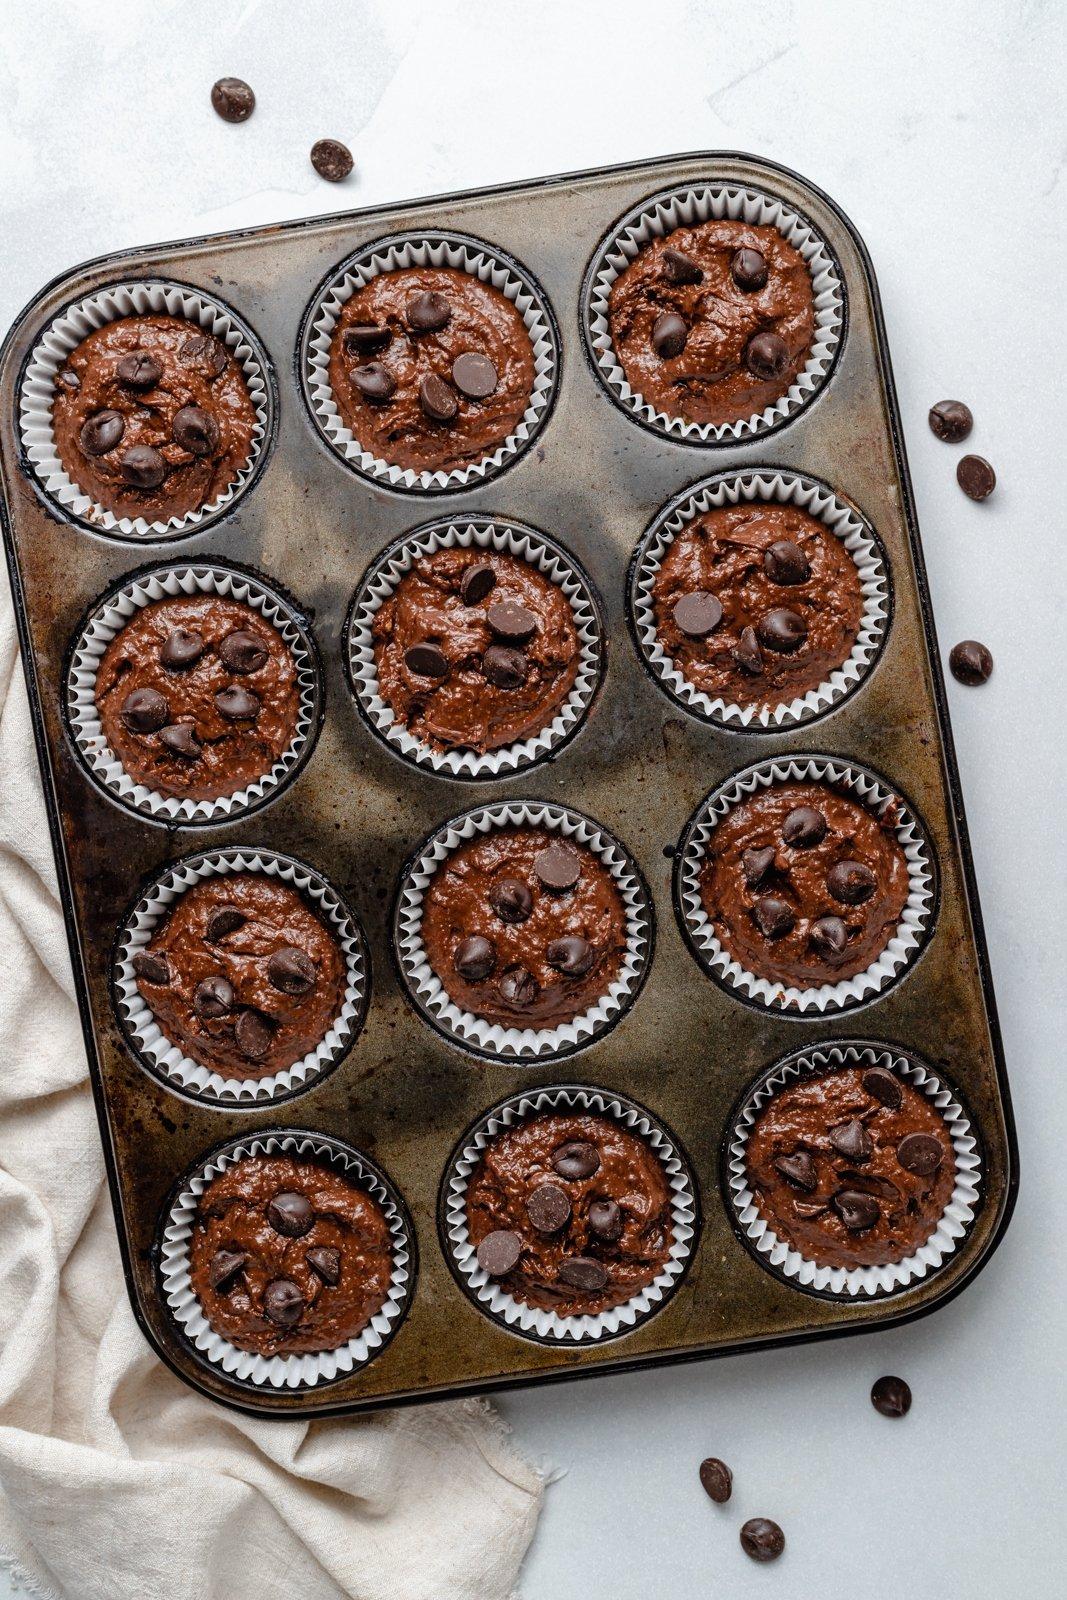 unbaked almond butter chocolate pumpkin muffins in a muffin tin